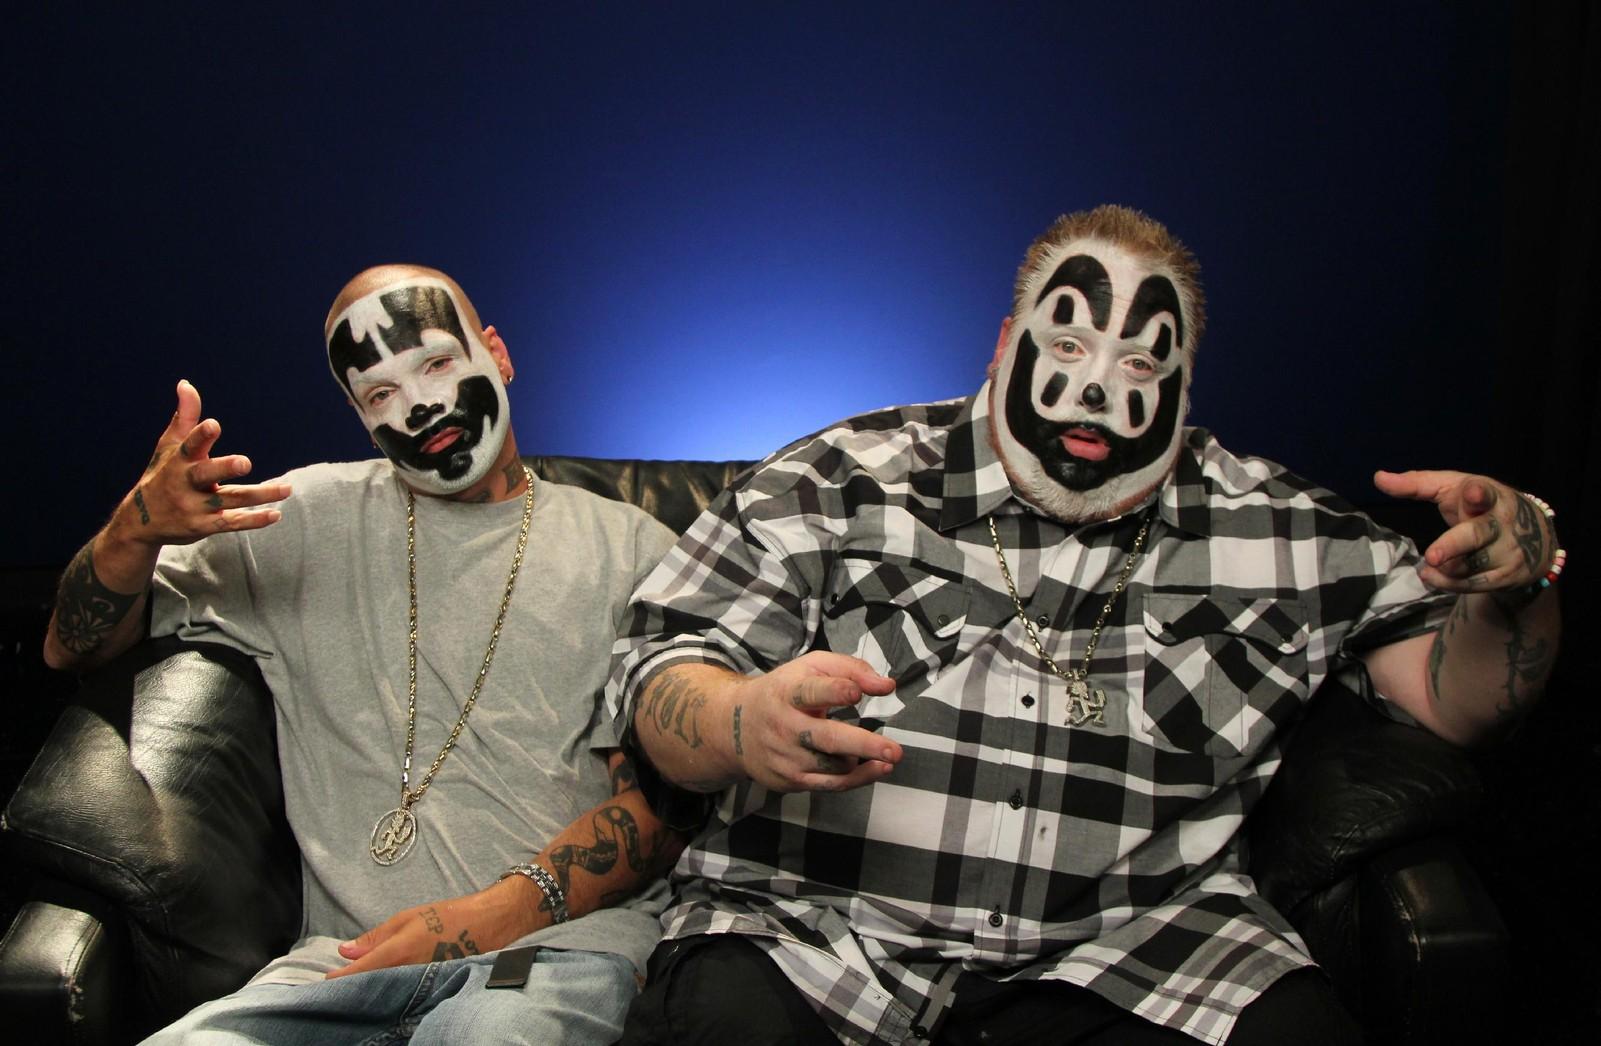 insane-clown-posse-650_0